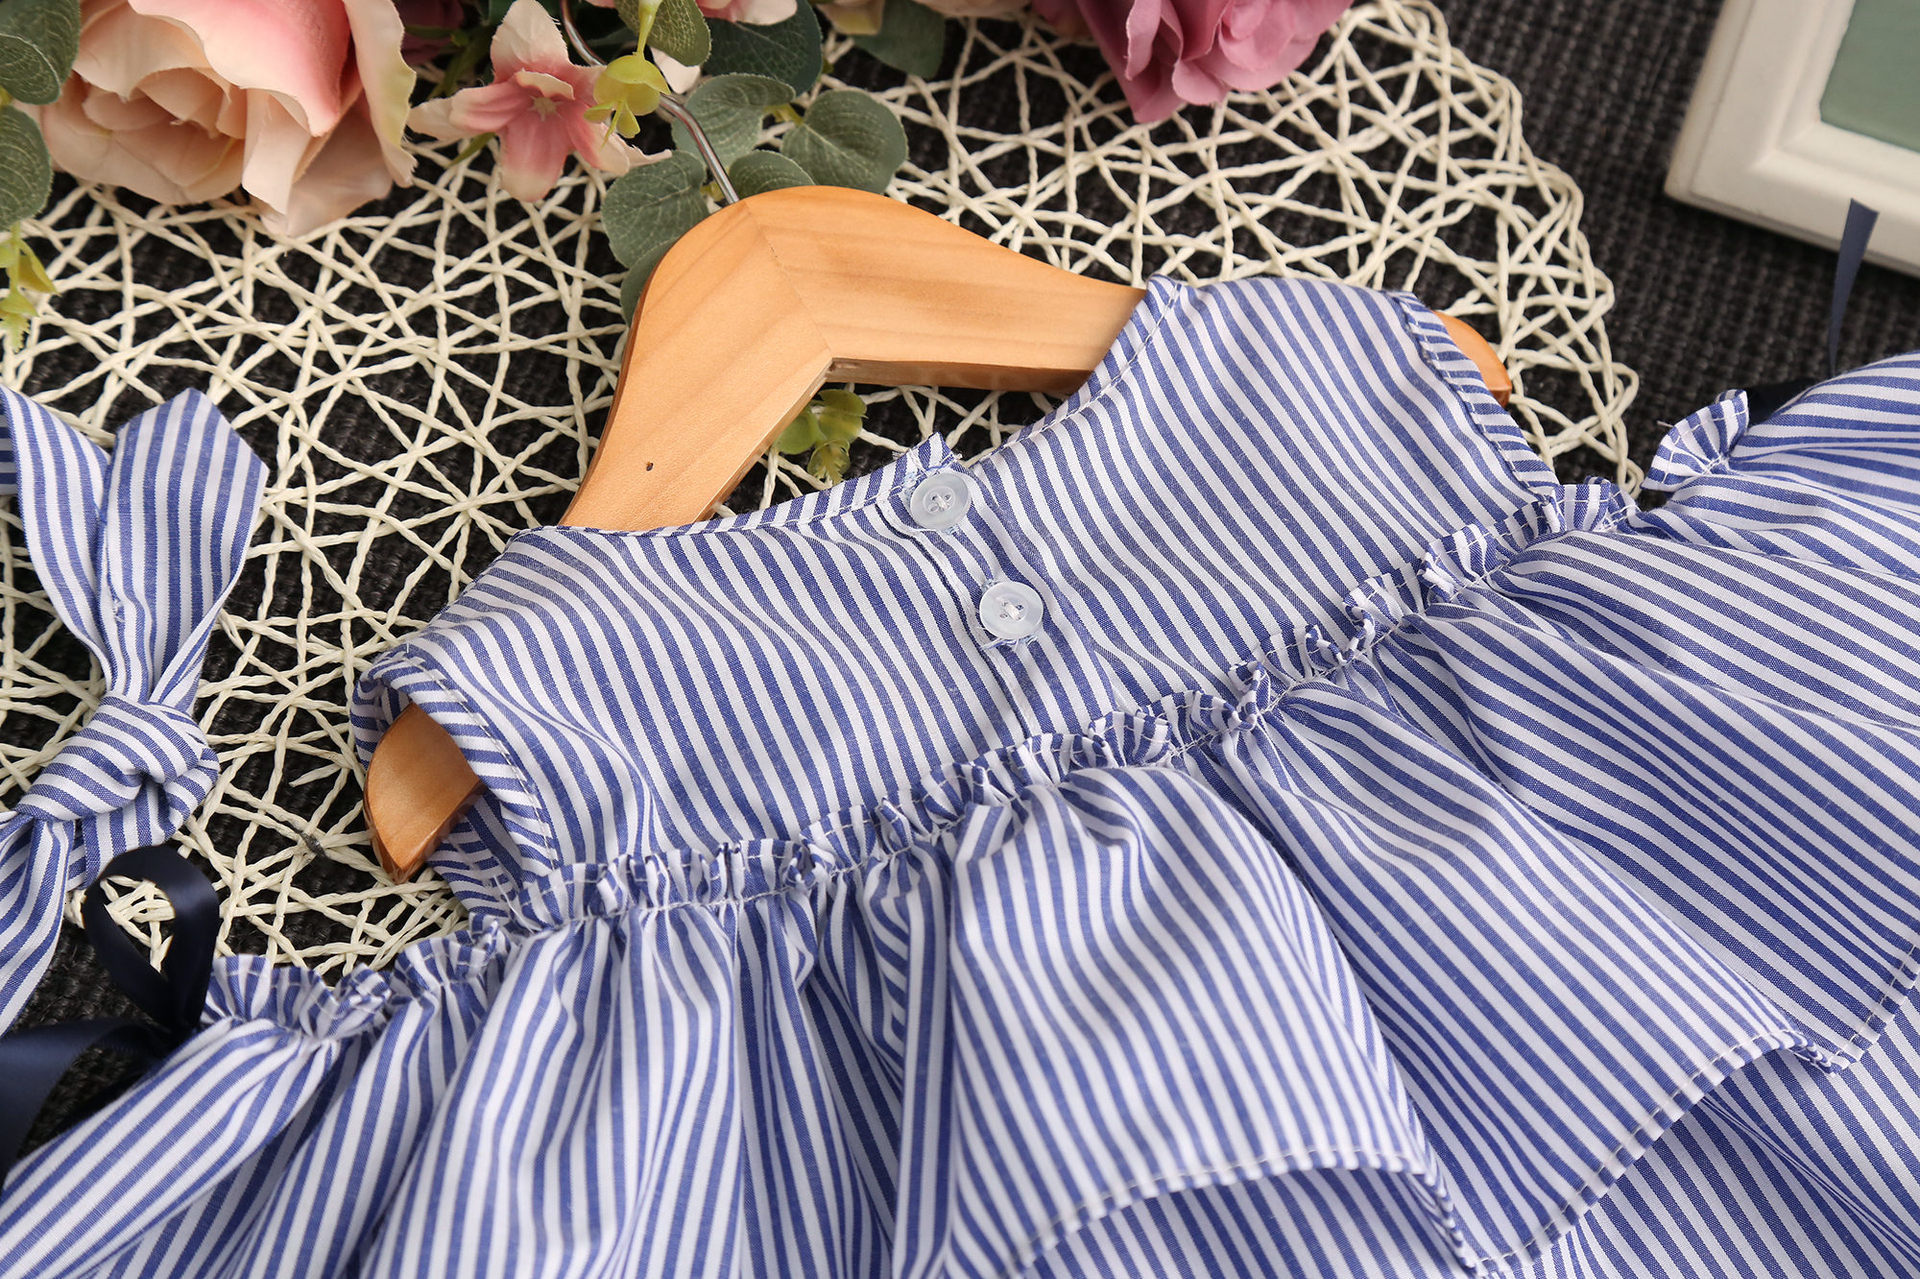 Hb5812a8ee2c34051842a4bc9a7d4b476b Lemon Girl Baptism New 2018 Sleeveless Kid Dresses Girls Party Princess Vestidos Nina 6 7 Year Cowboy Dress